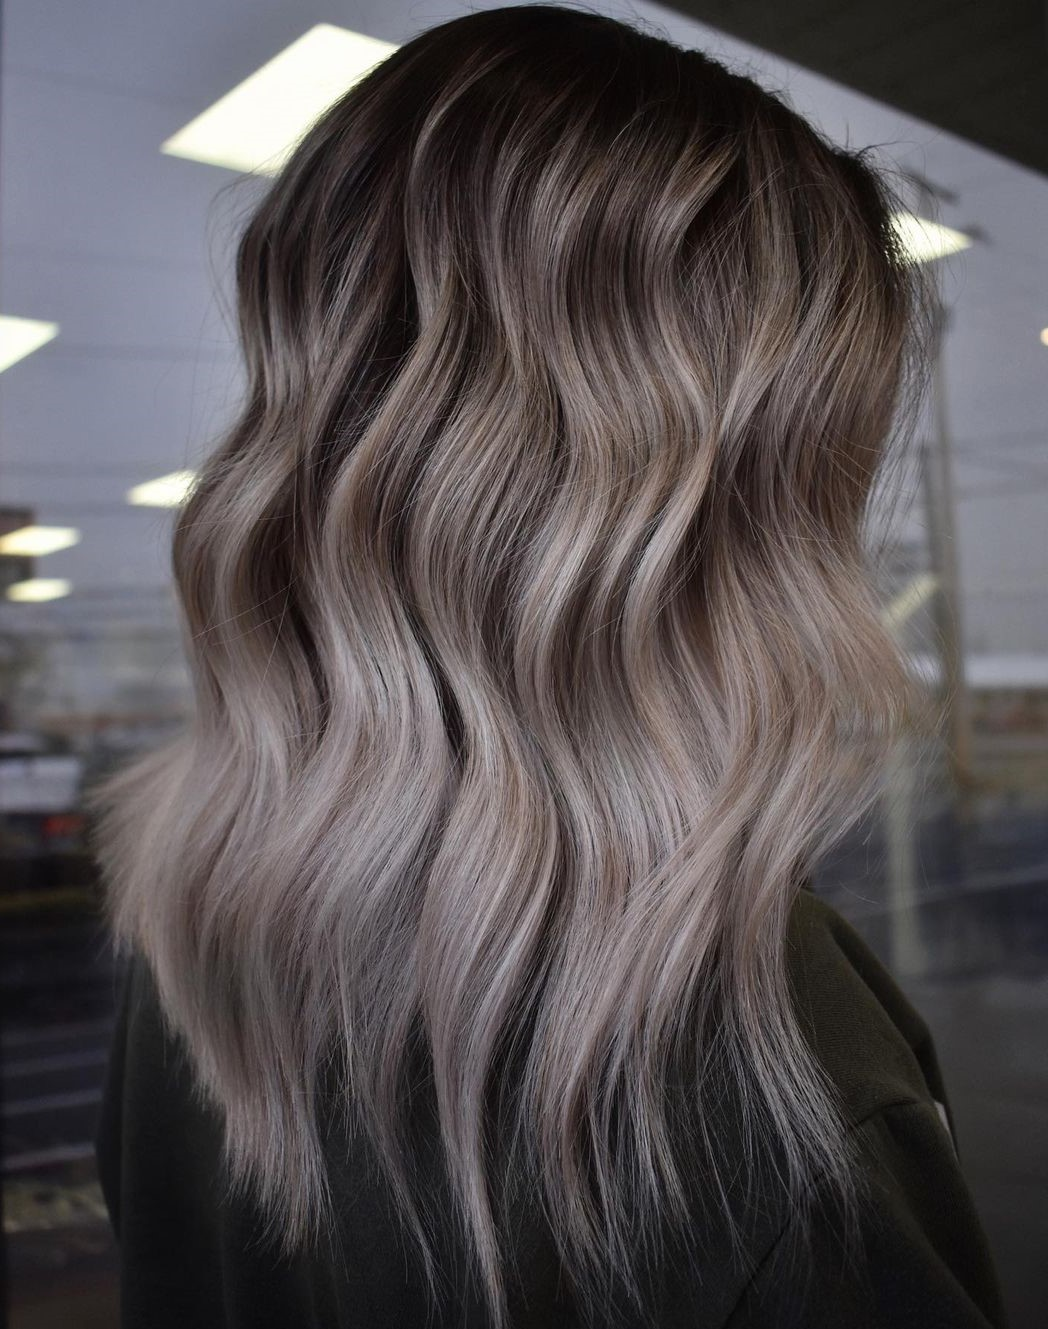 Mushroom Brown Hair with Ashy Highlights